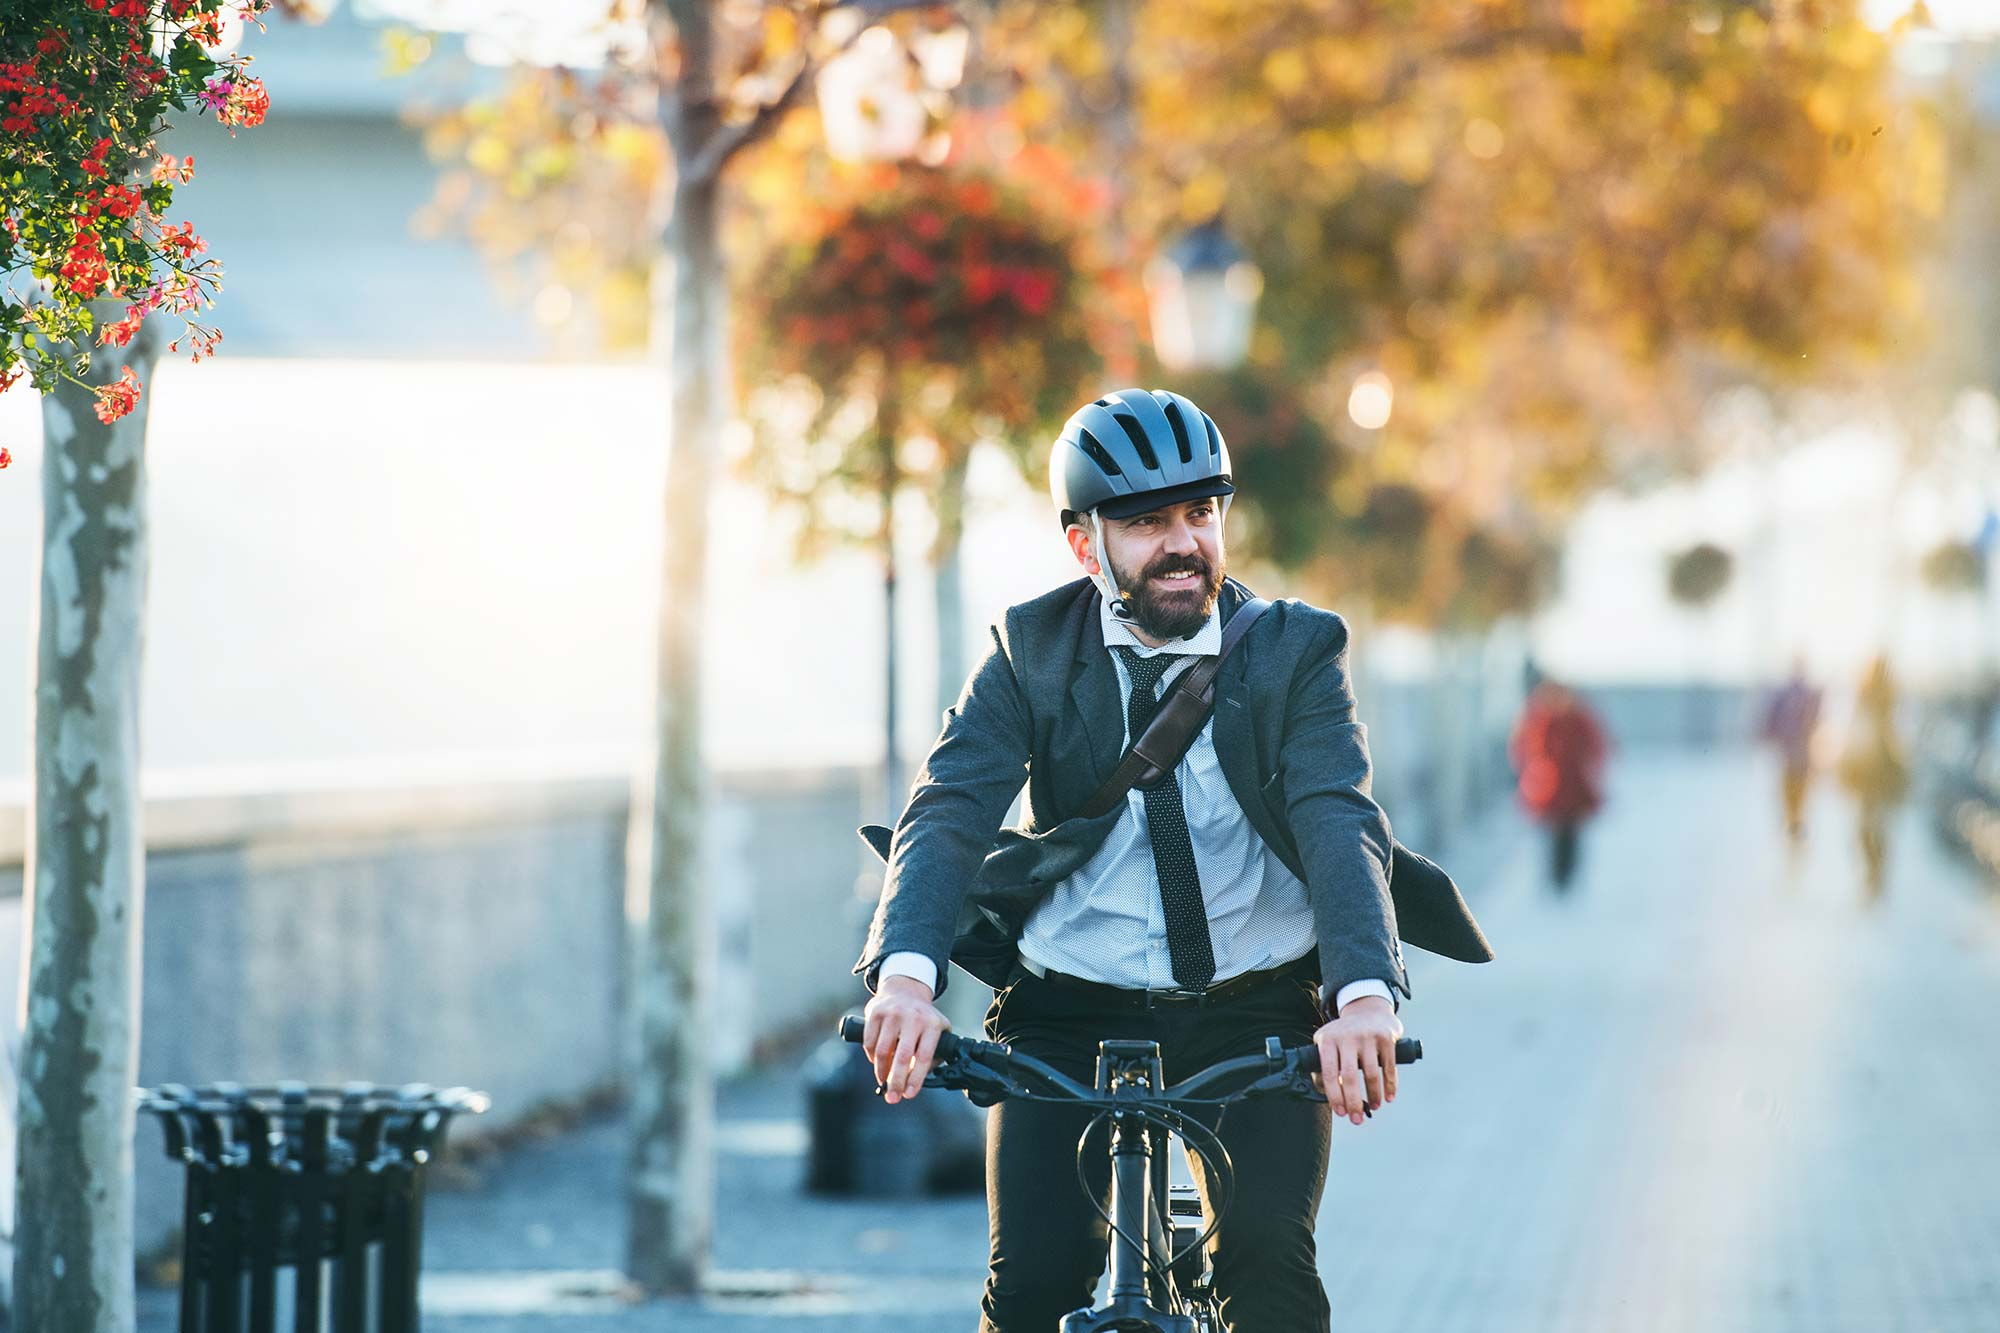 elecitic-bikes-plus-ebikes